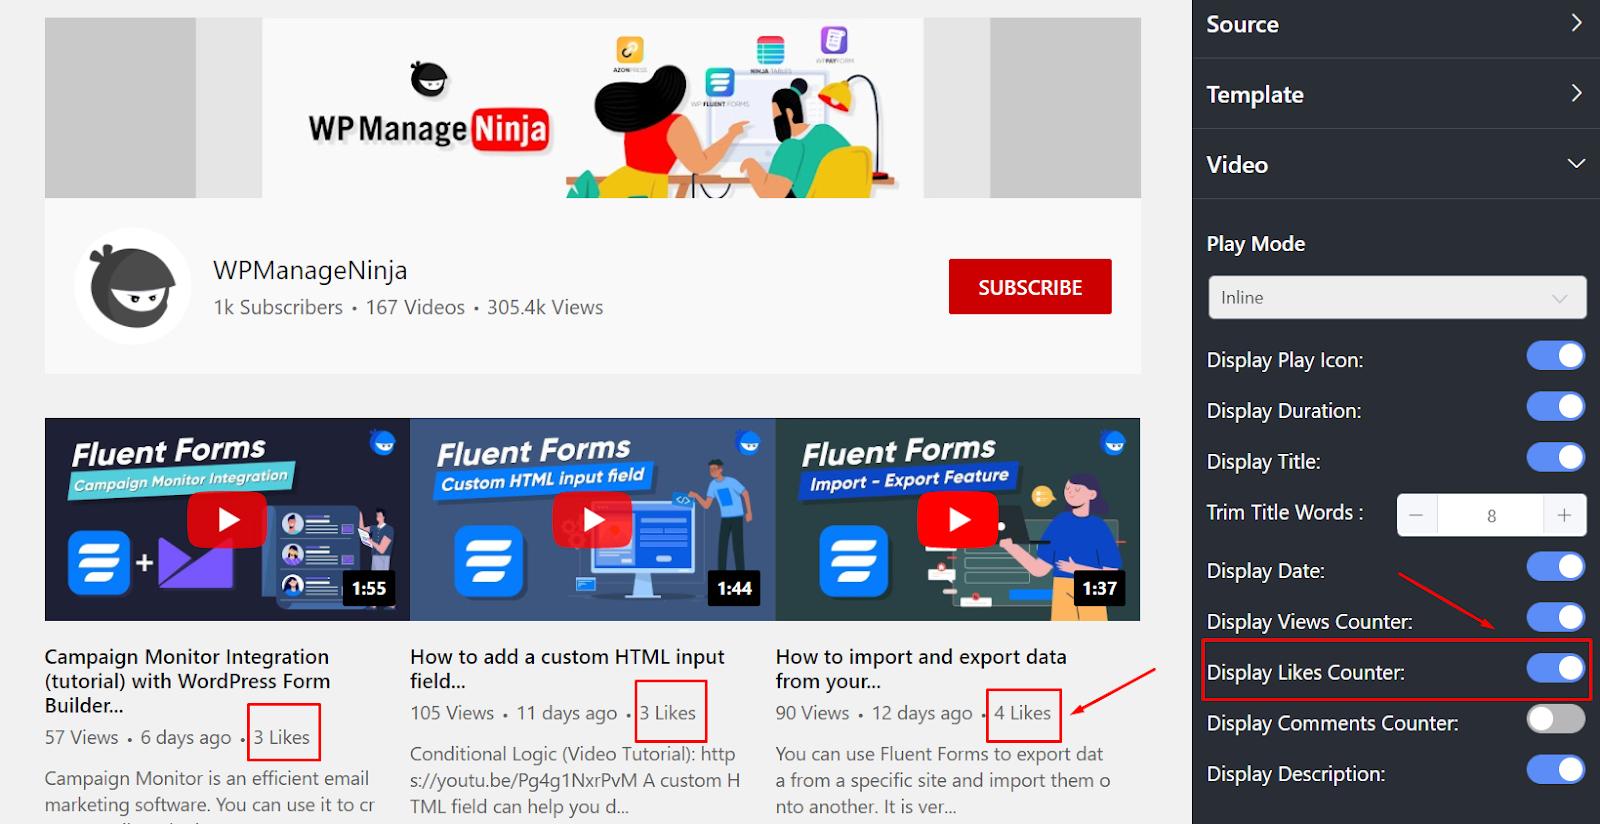 YouTube settings display likes counter